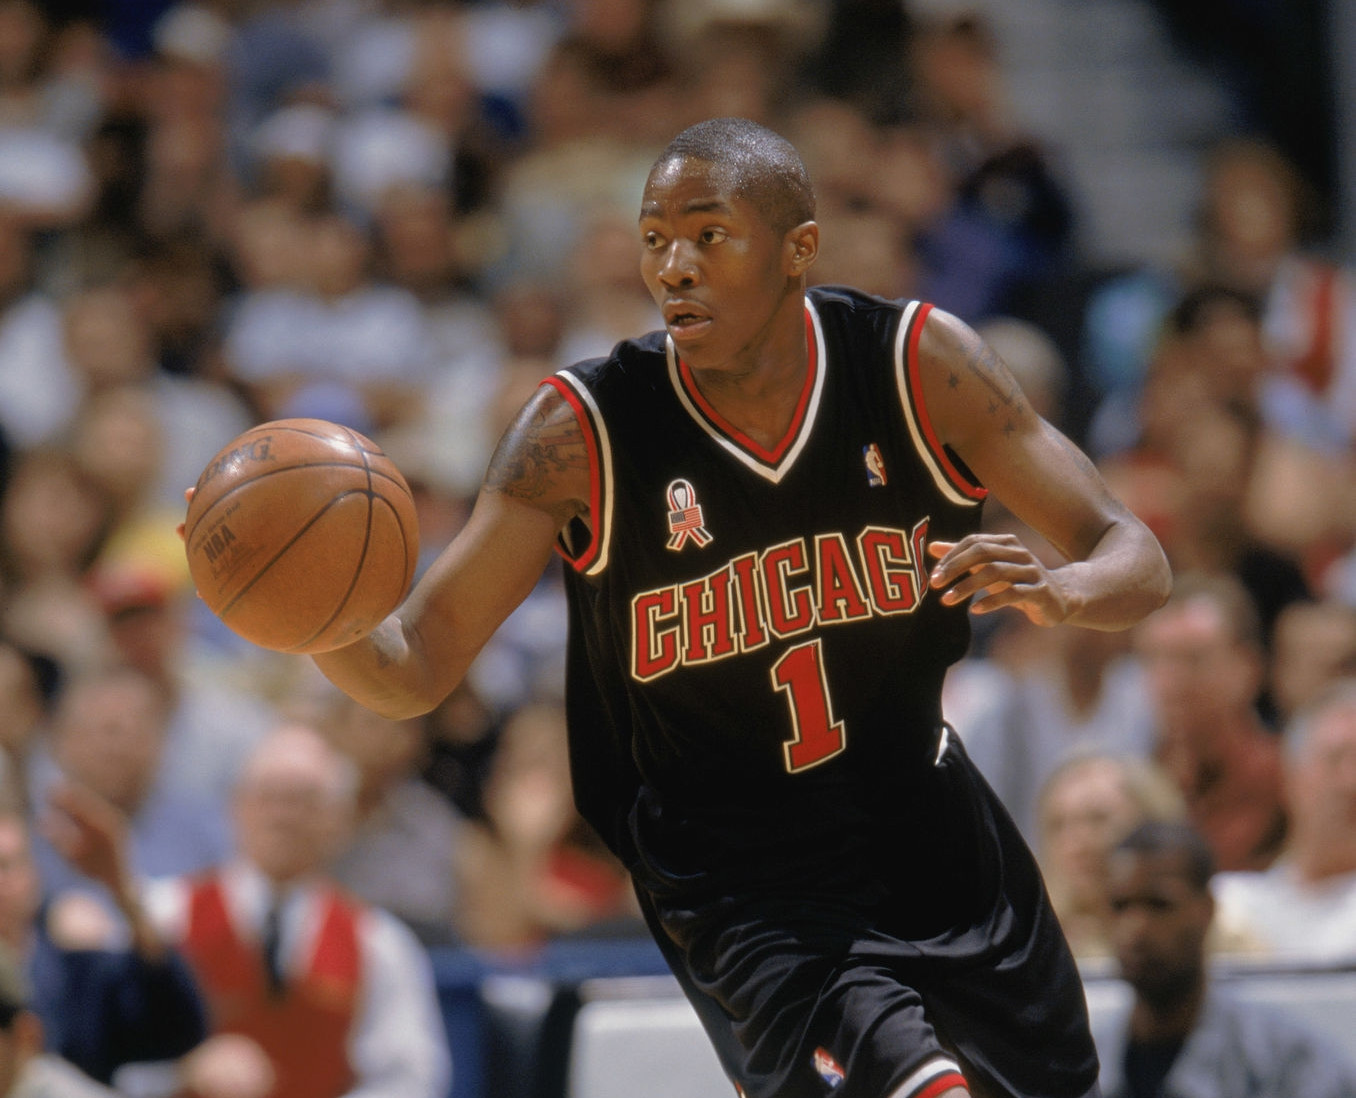 Jamal Crawford, Chicago Bulls